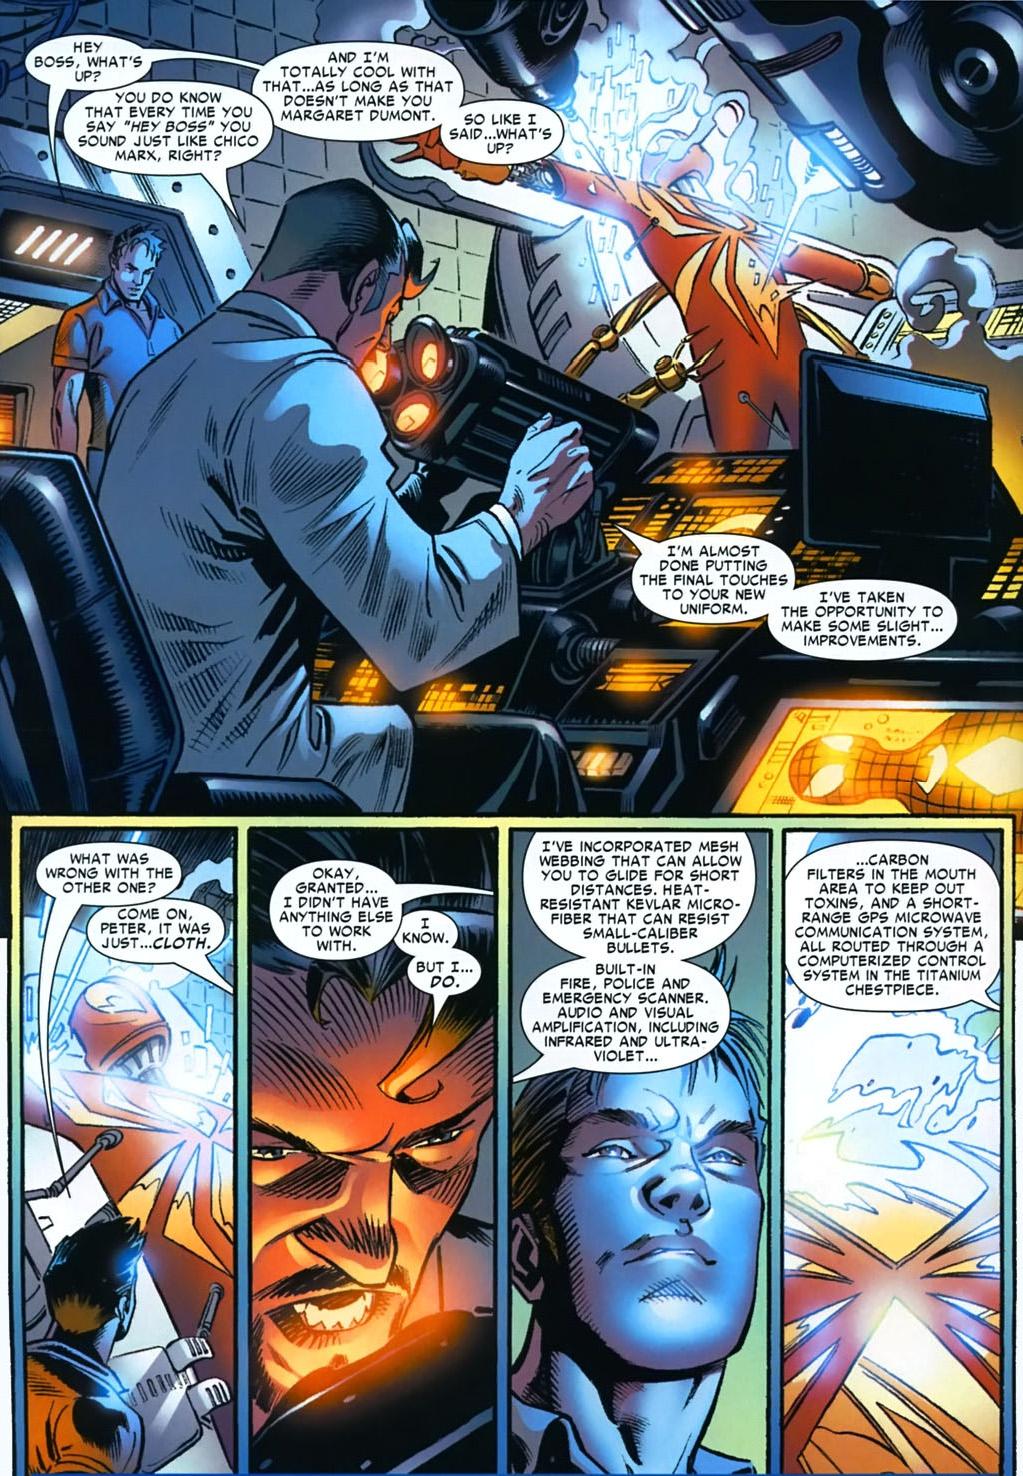 tony-stark-creates-the-iron-spider-suit-1